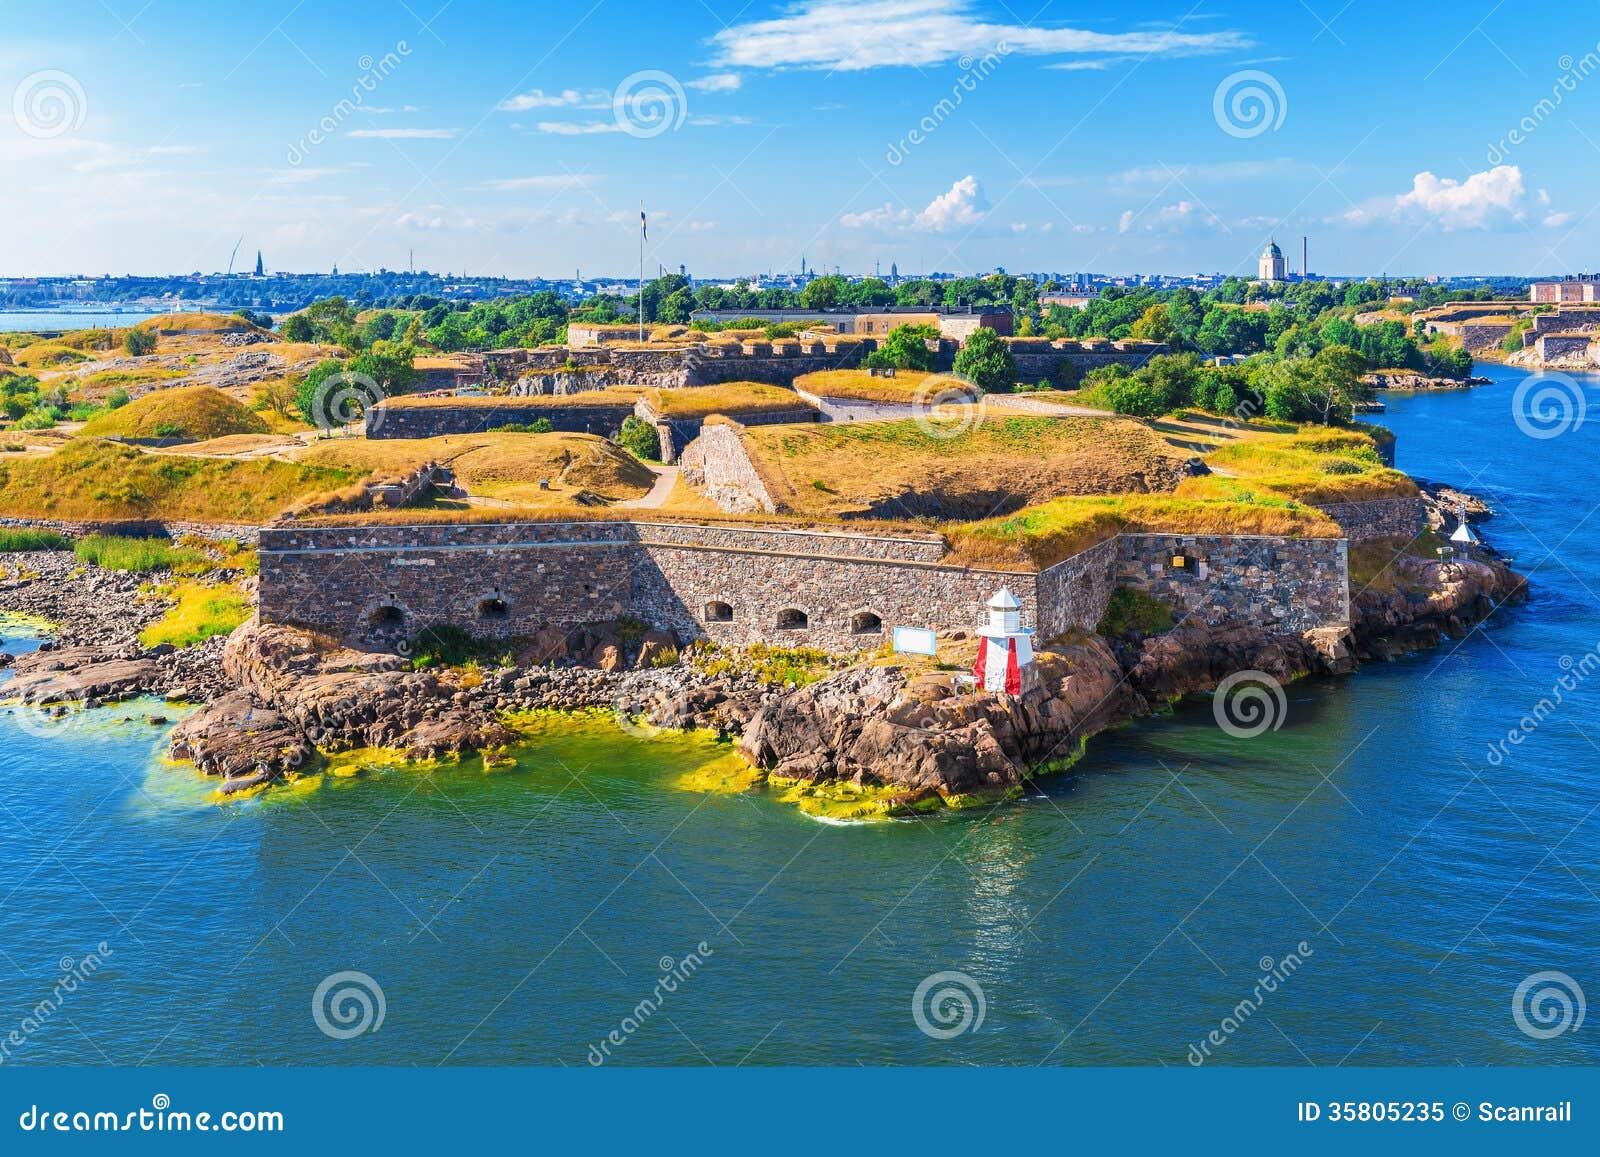 Suomenlinna (Sveaborg) fortress in Helsinki, Finland